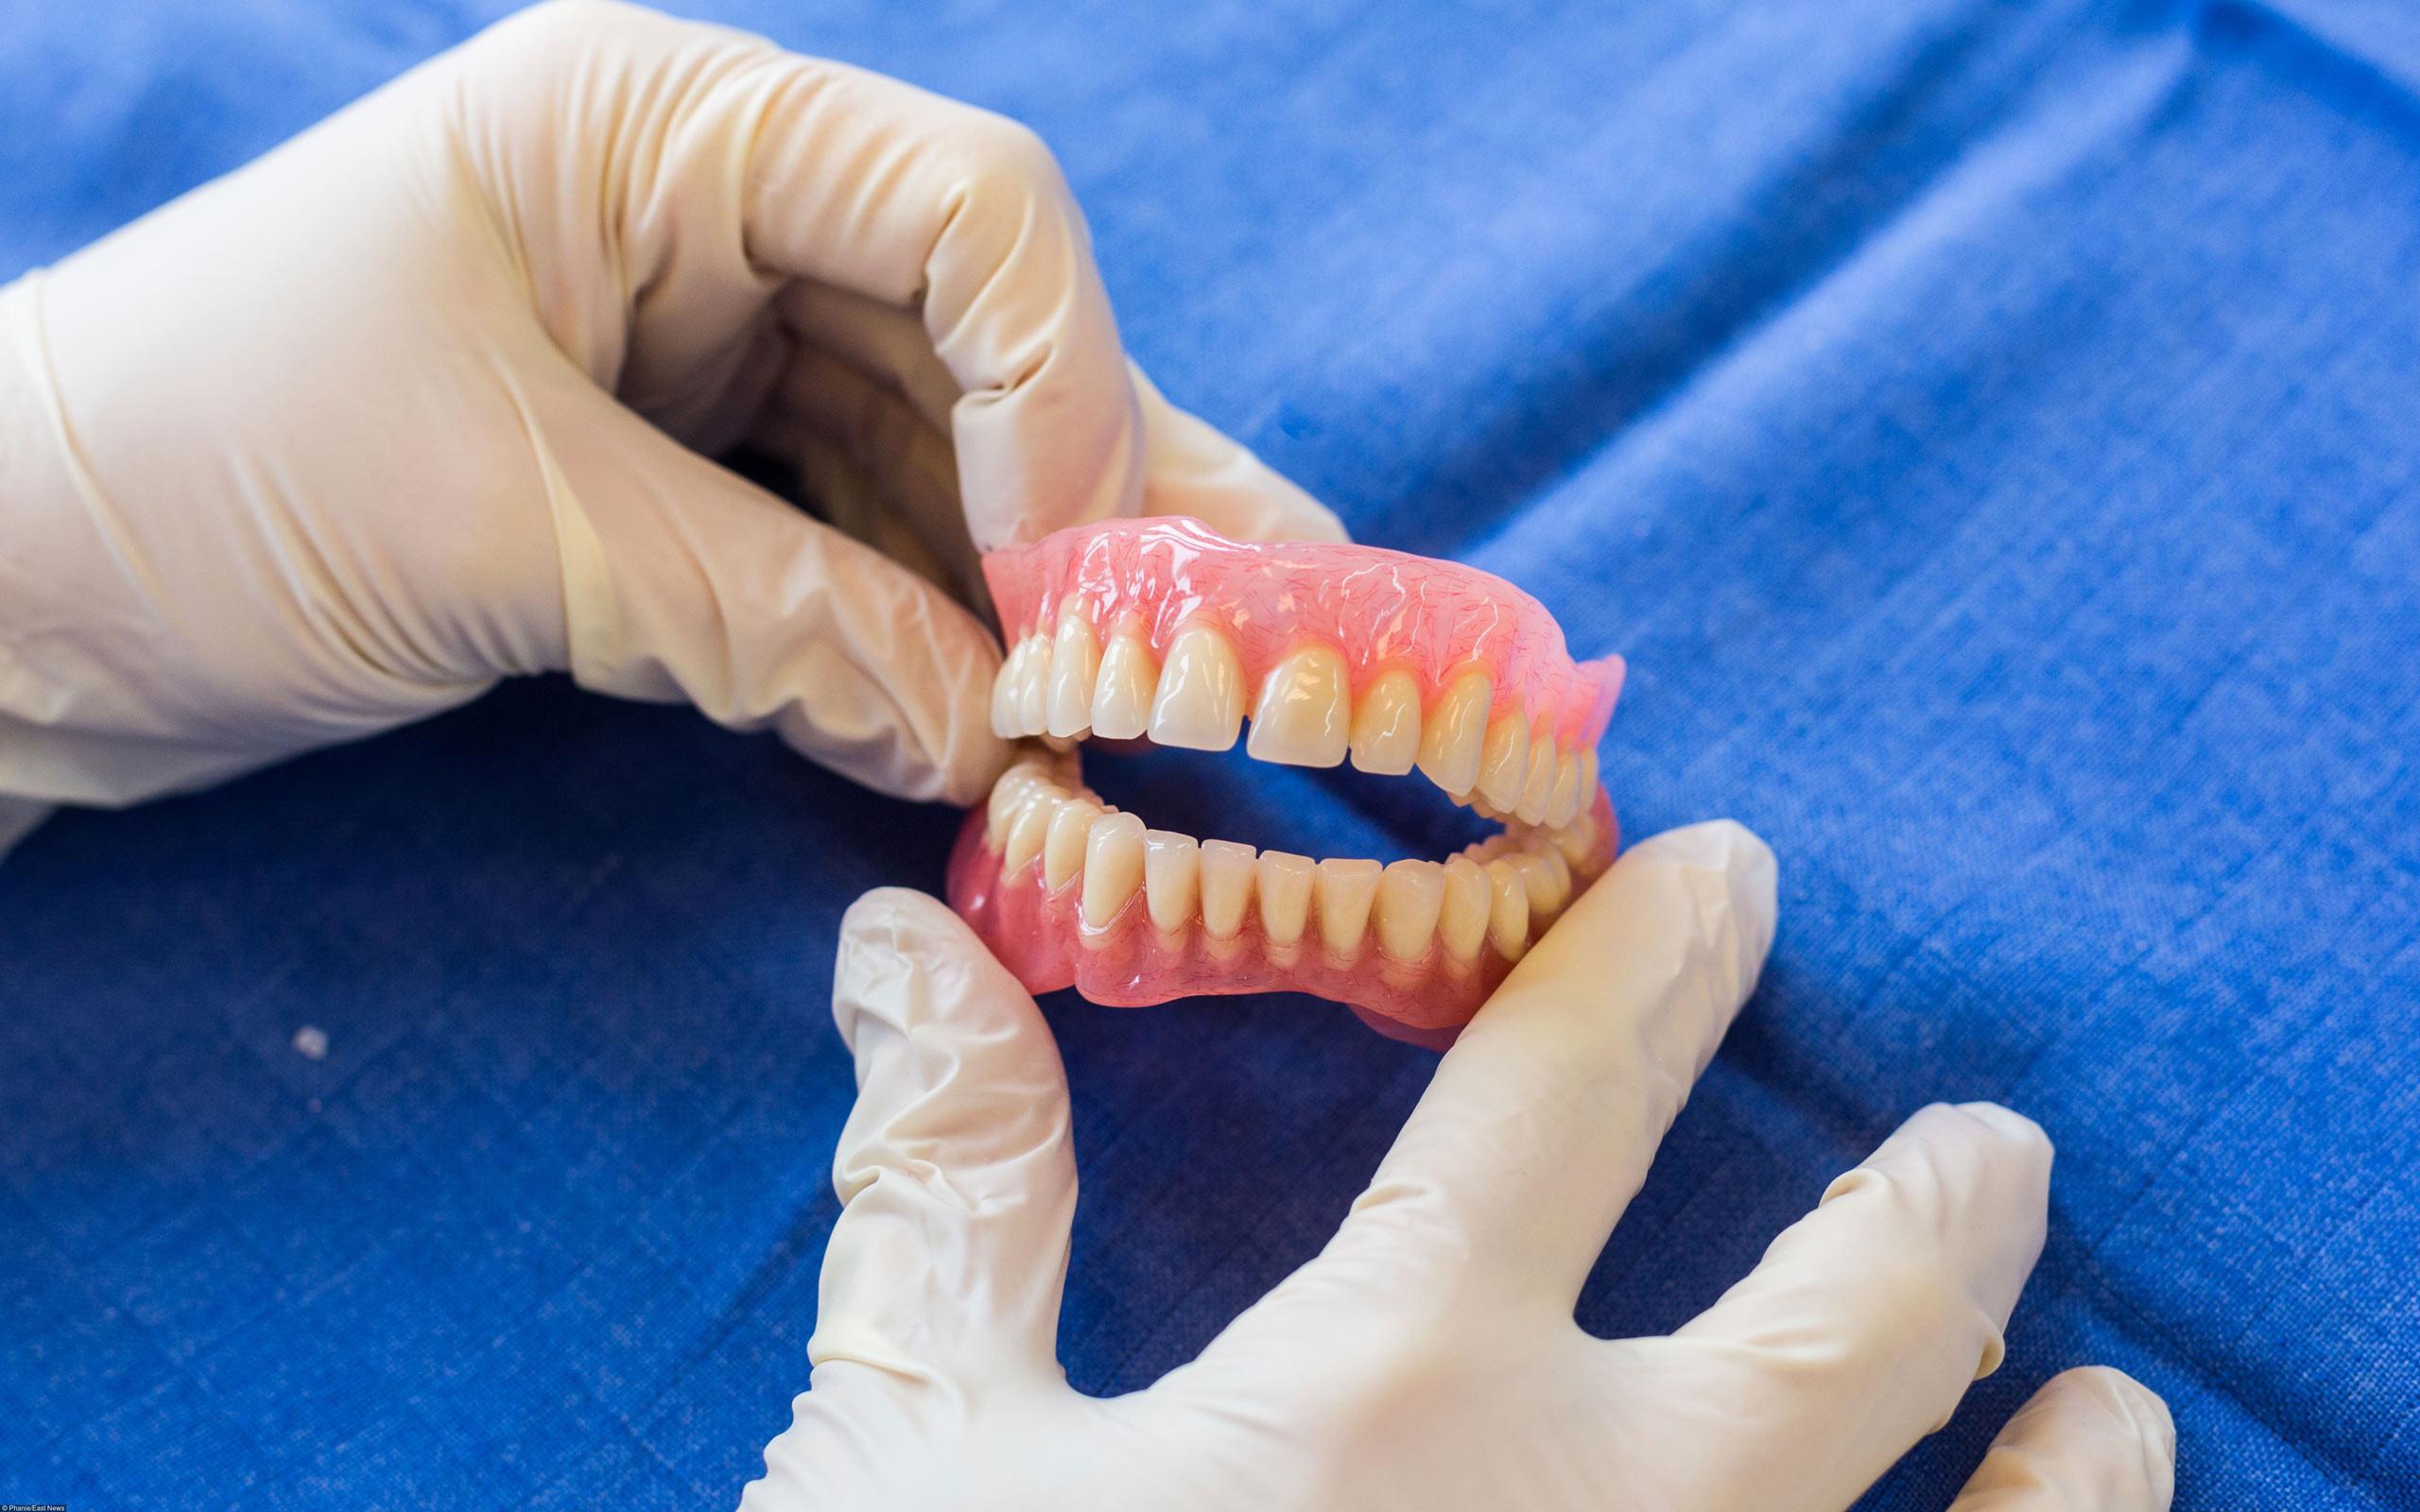 Лечение зубов без анестезии